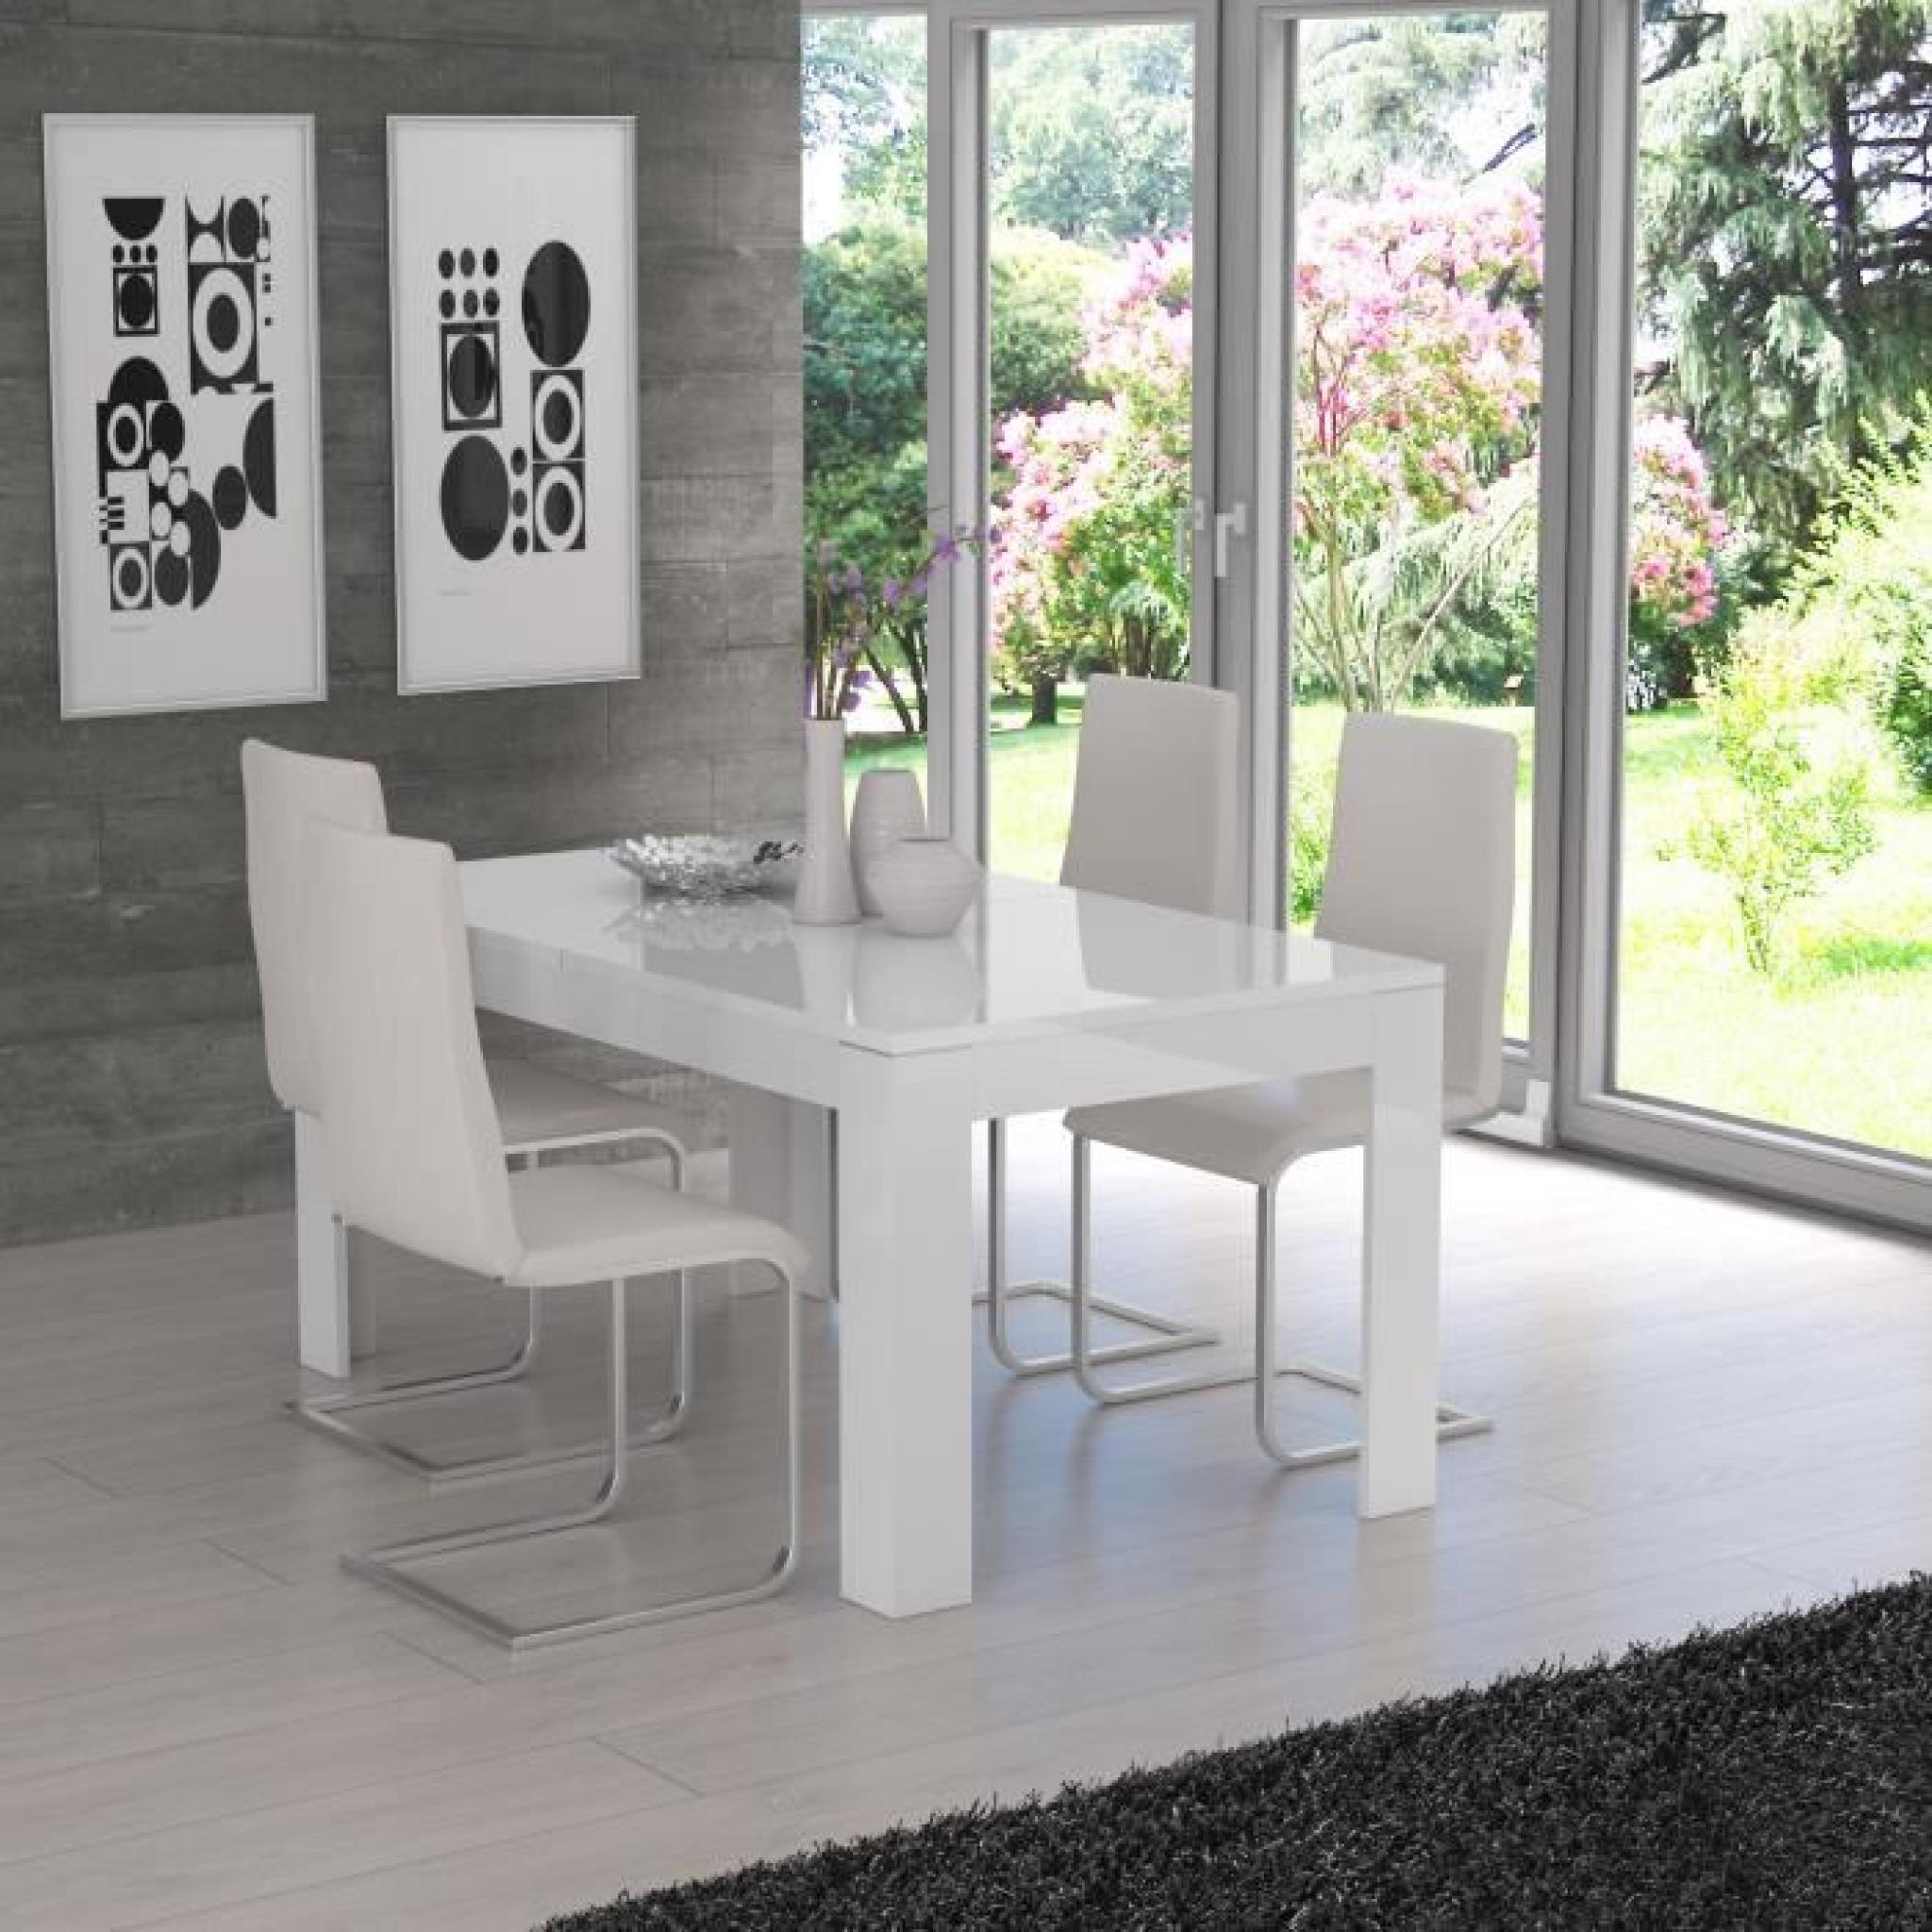 Table à extensible 207x75cm manger 160 FINLANDEK blanc KOVA mat txrCQBshdo